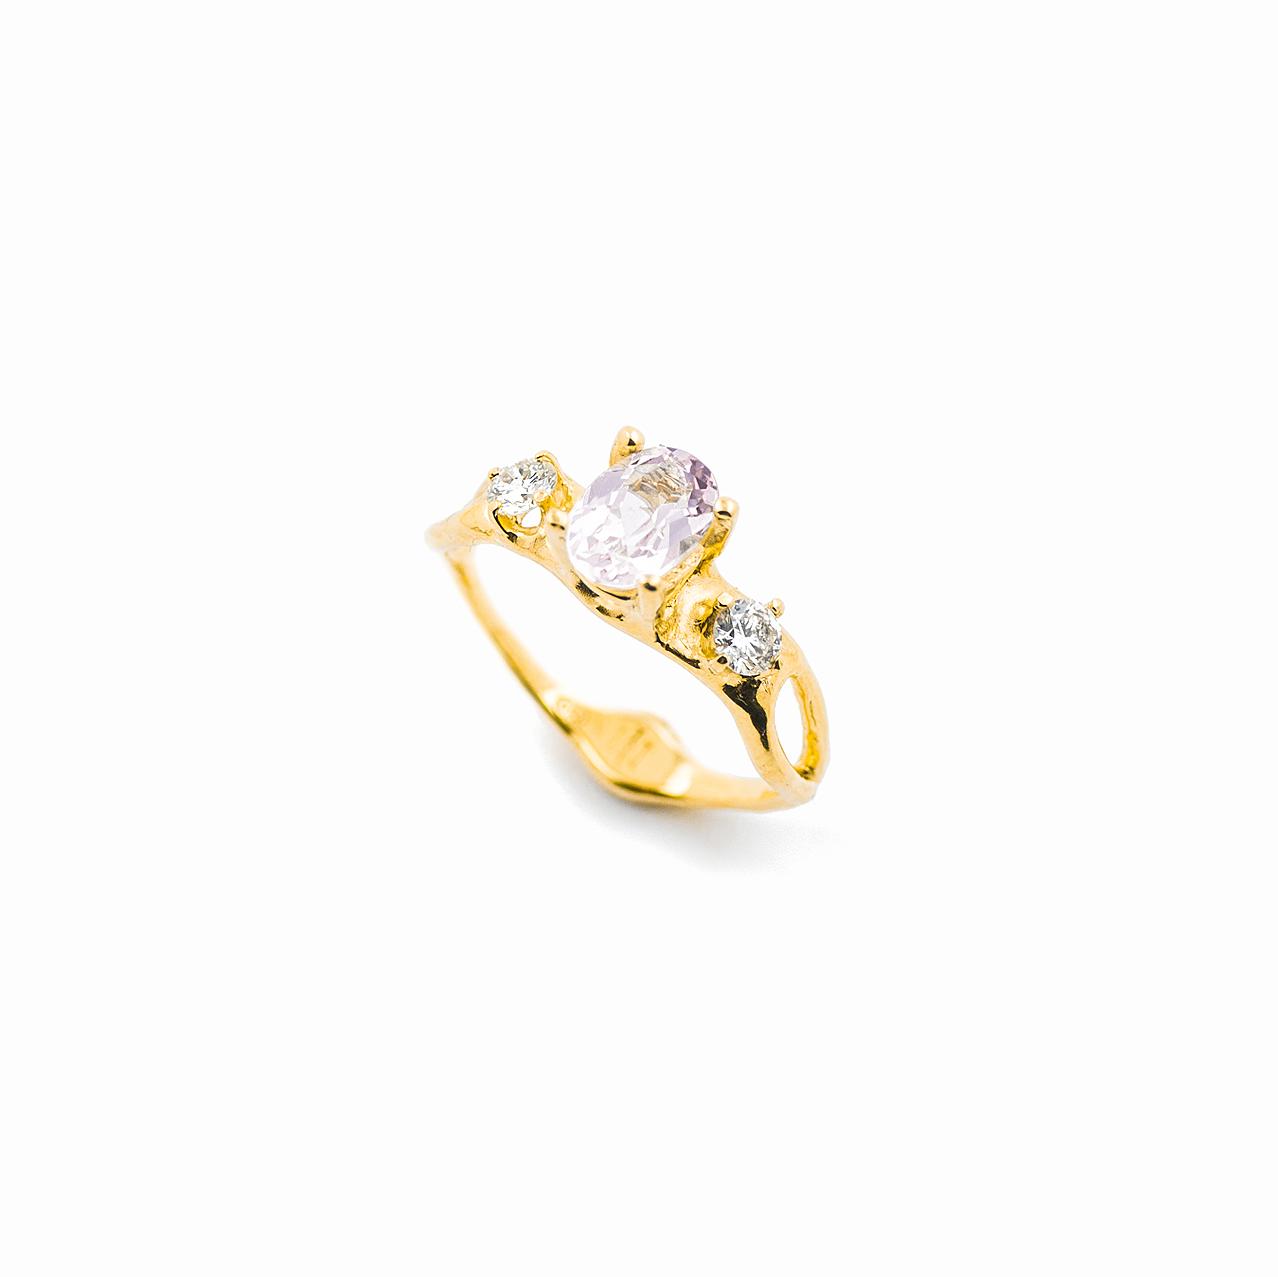 Unfolding Ring | 18ct yellow gold, morganite, white diamonds.